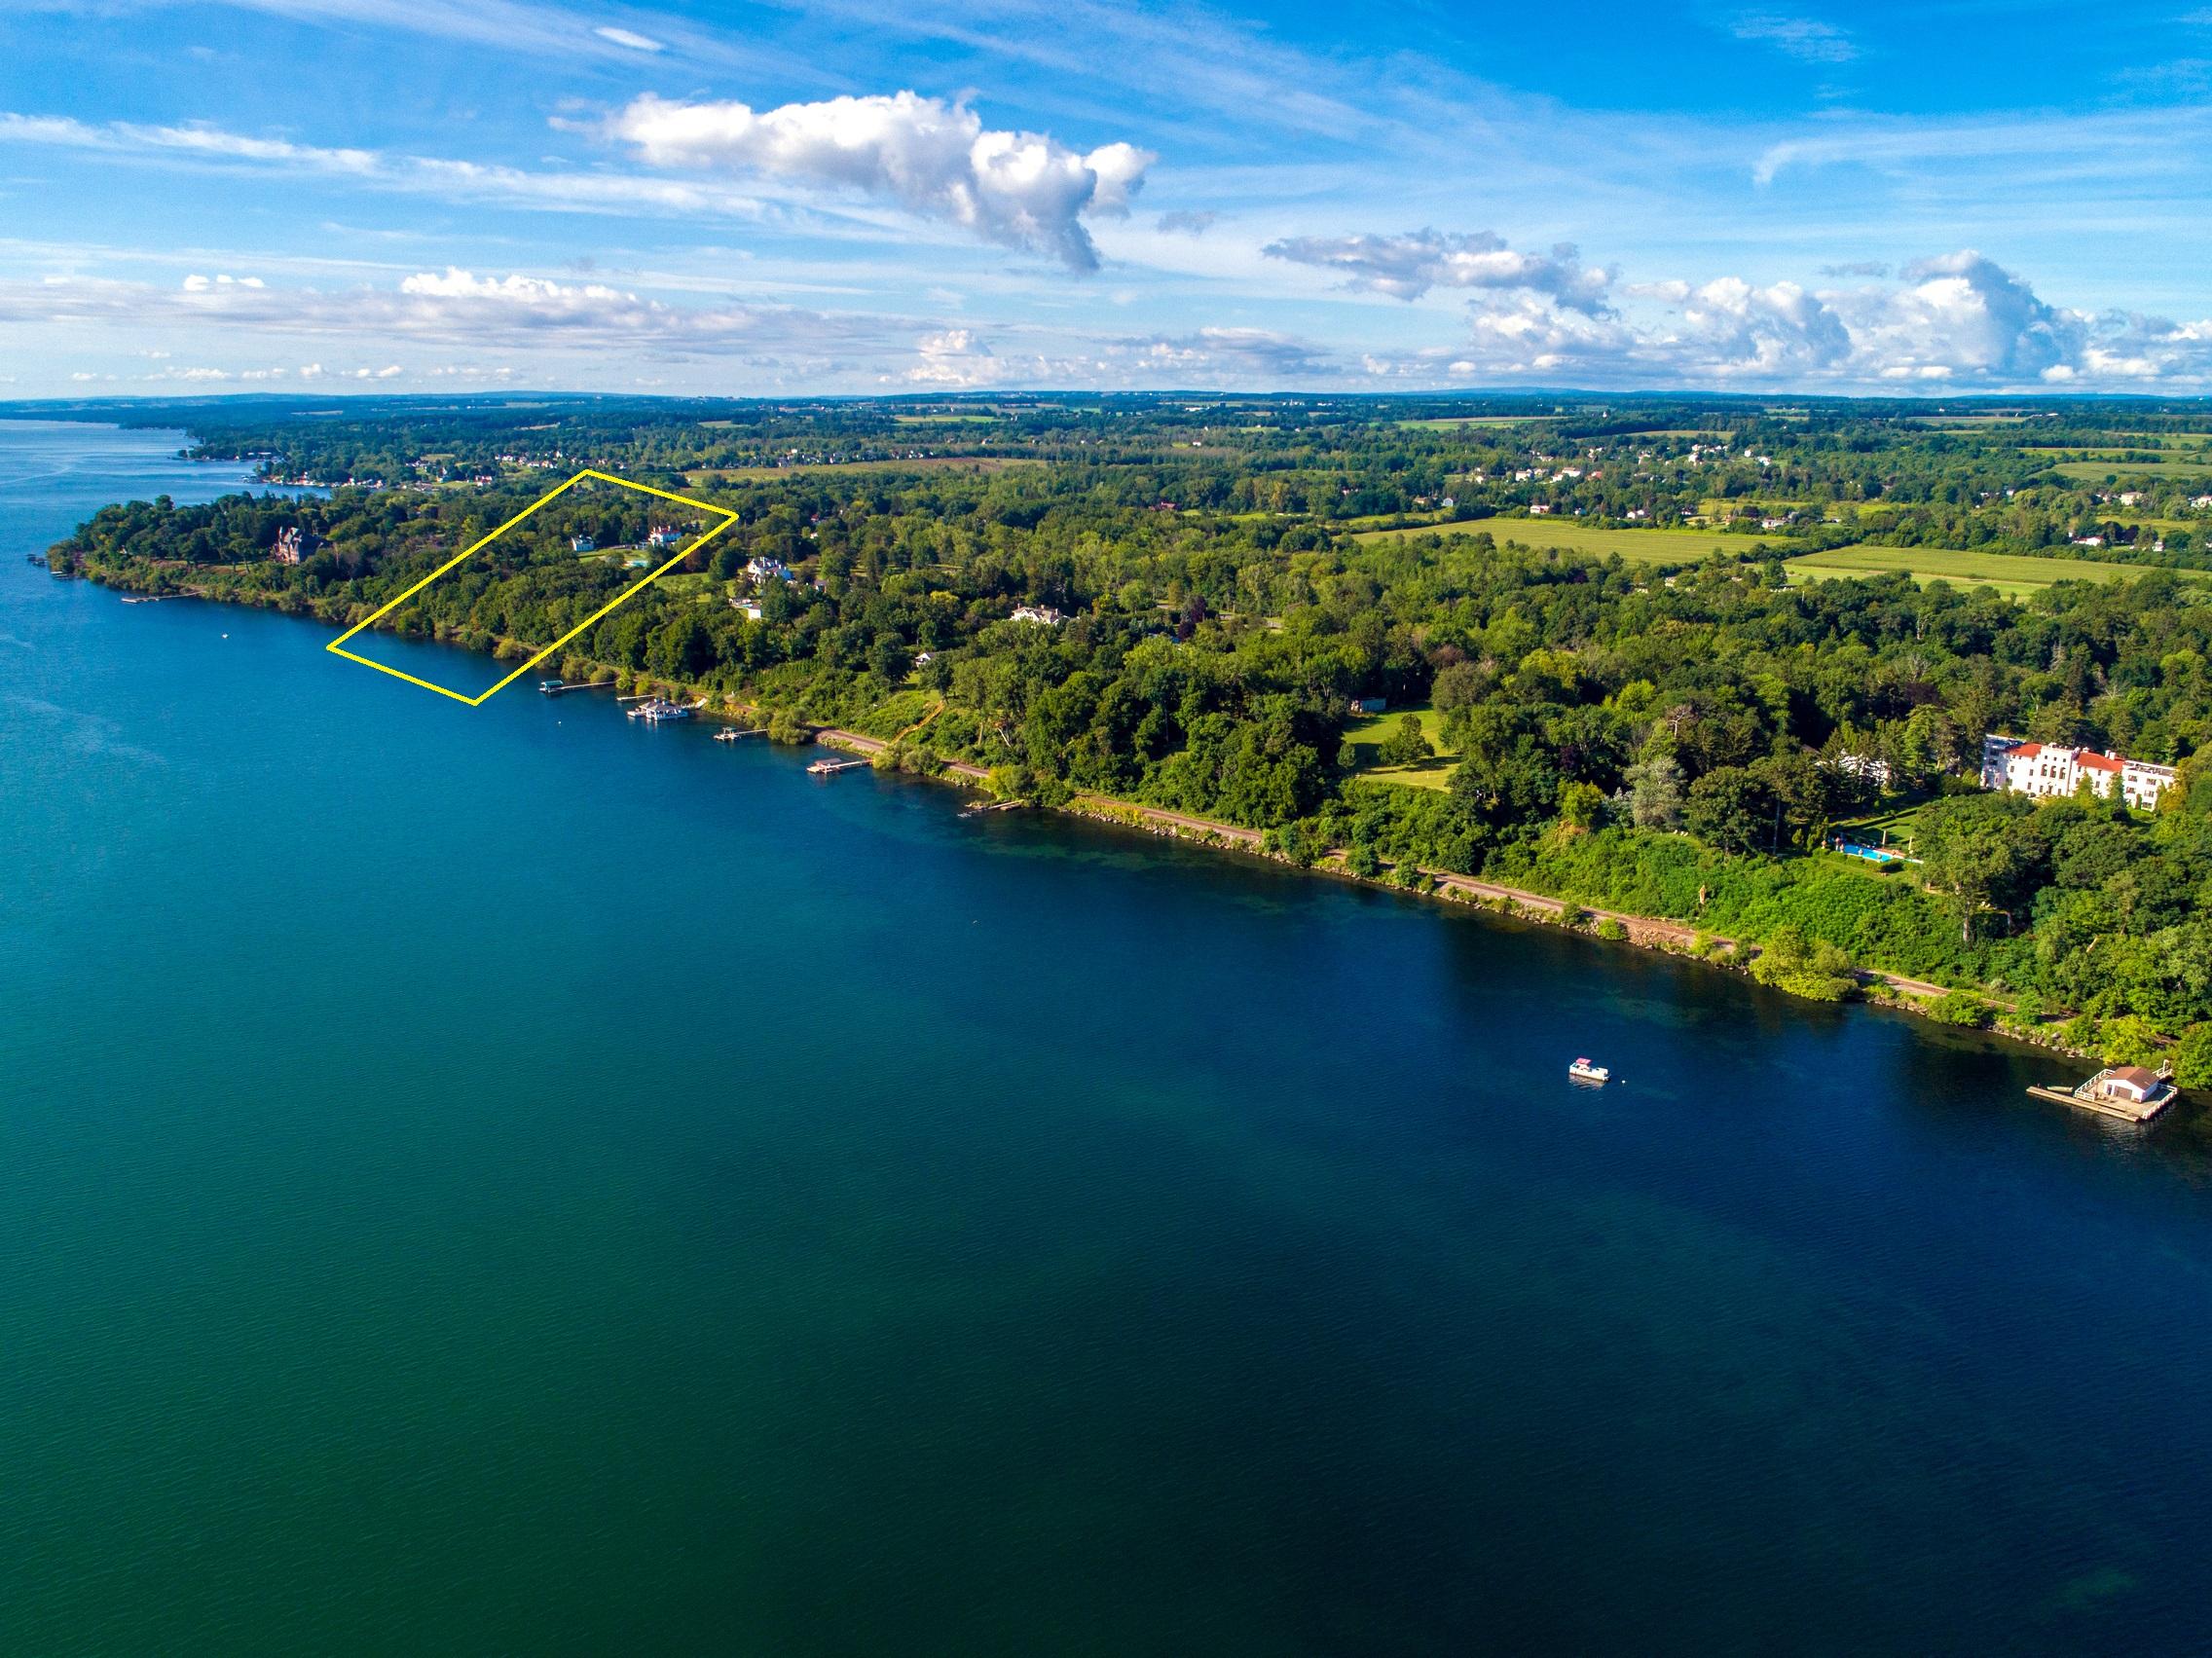 8  Seneca Lake Auction, American Legion, 1115 Lochland Rd, Geneva, NY 14456, Seneca Lake, Finger Lakes Property Listed For Sale by Michael DeRosa, Real Estate Broker, Michael DeRosa Exchange.jpg